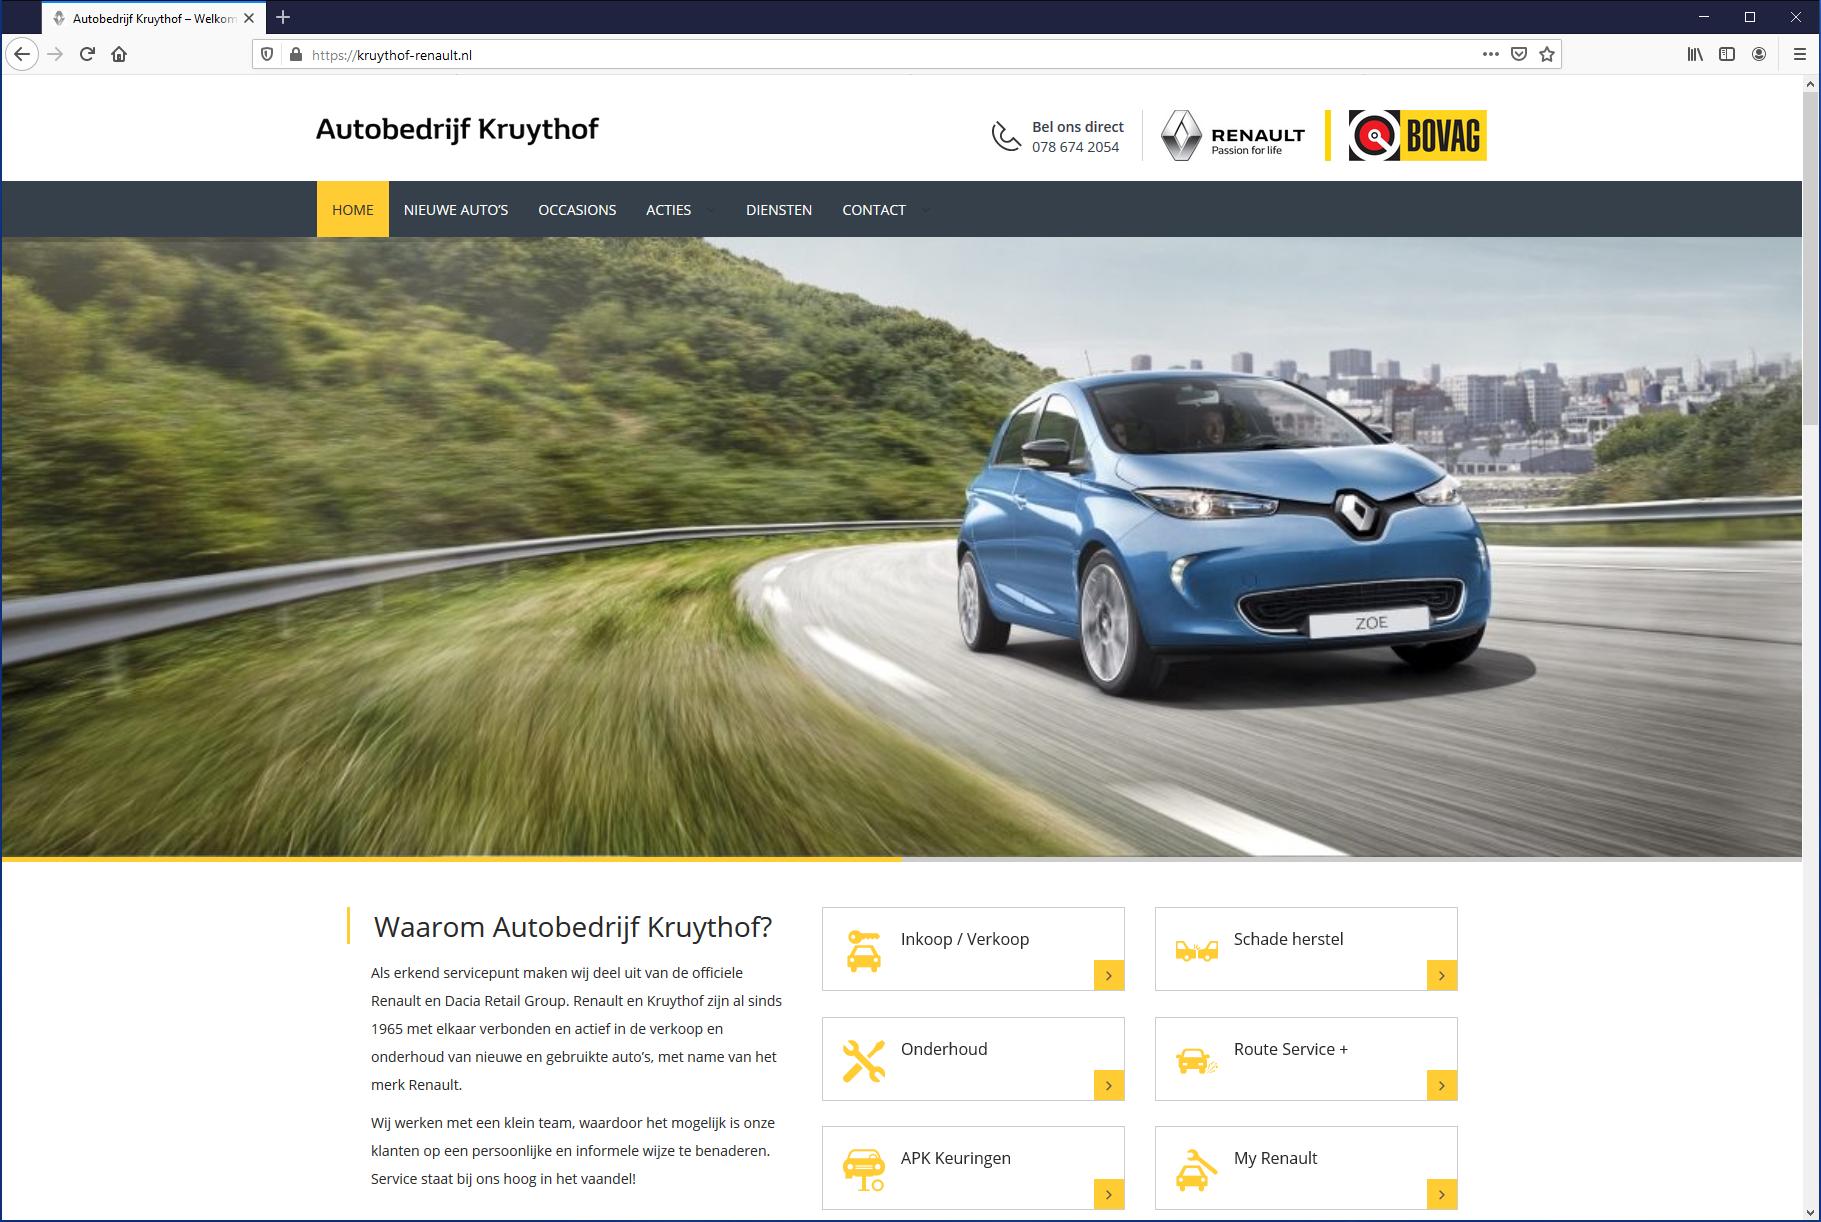 Renault Autobedrijf Kruythof